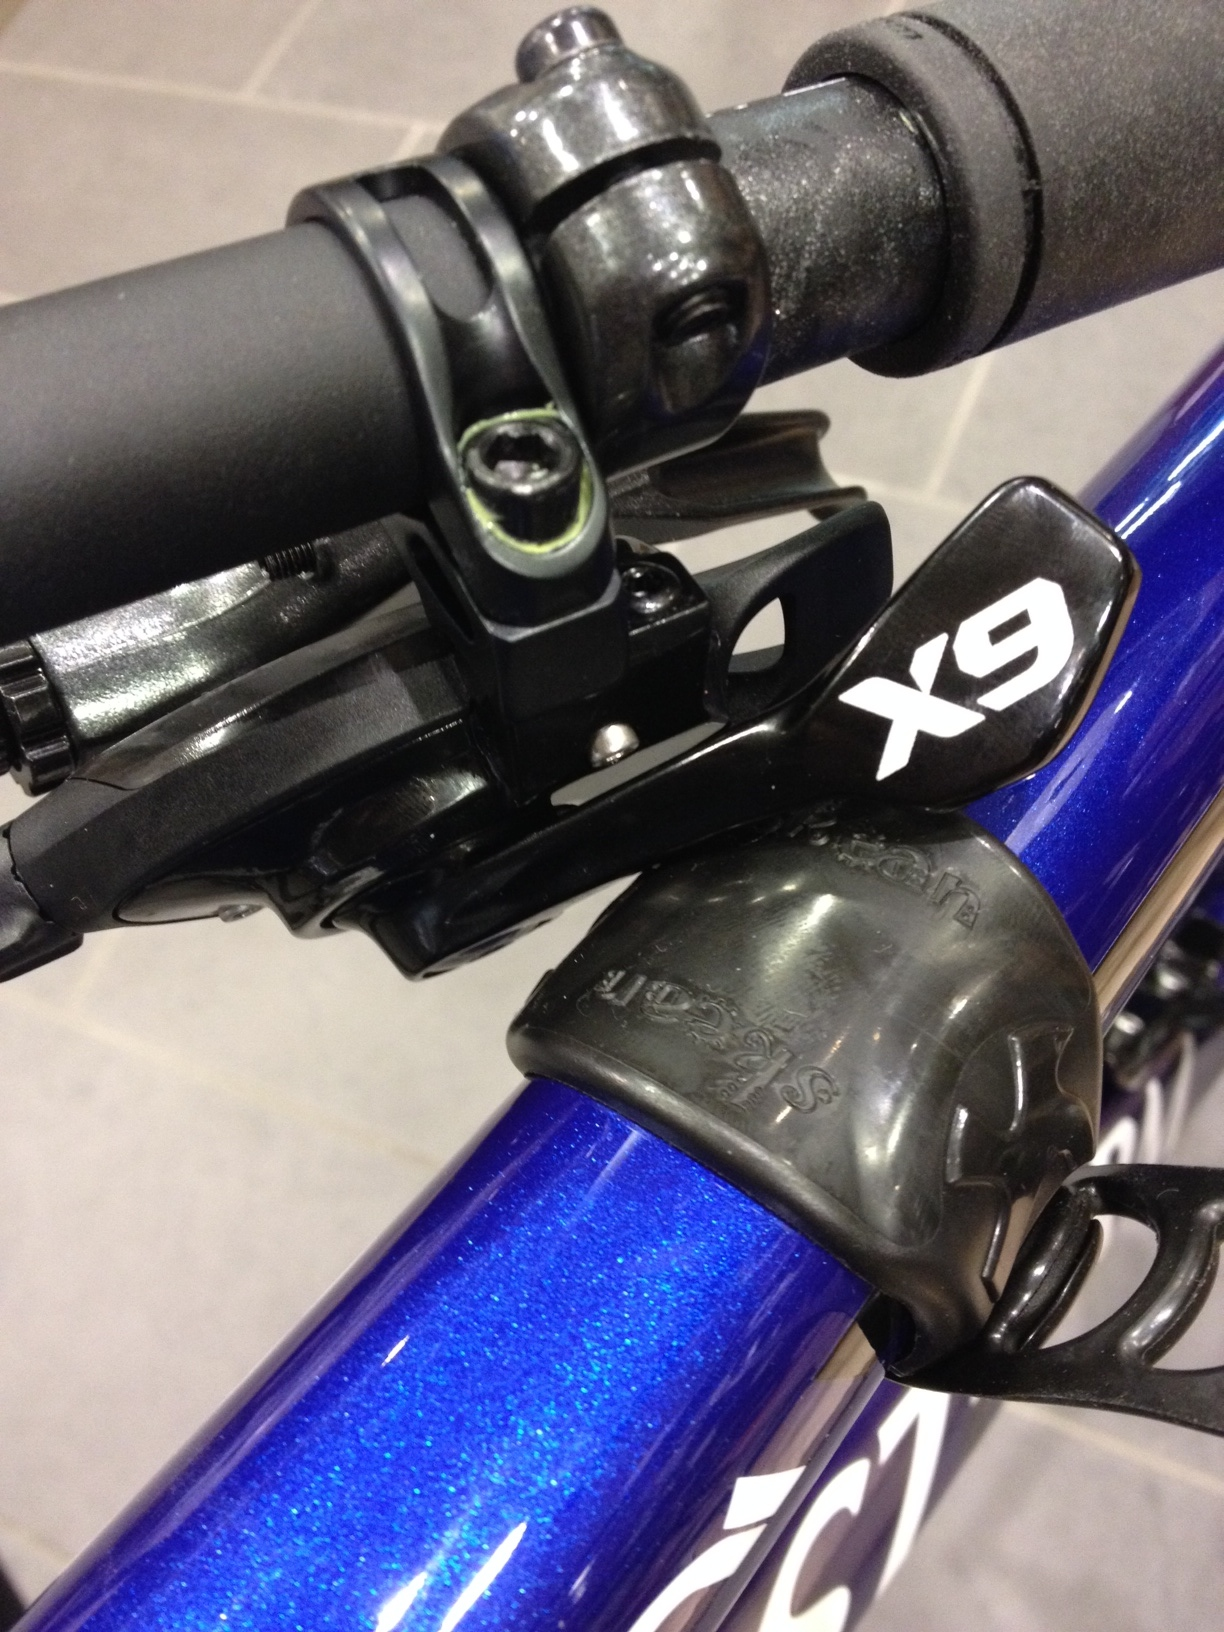 Uitgelezene Skean Top Tube Frame Protector - Beukers TP-17